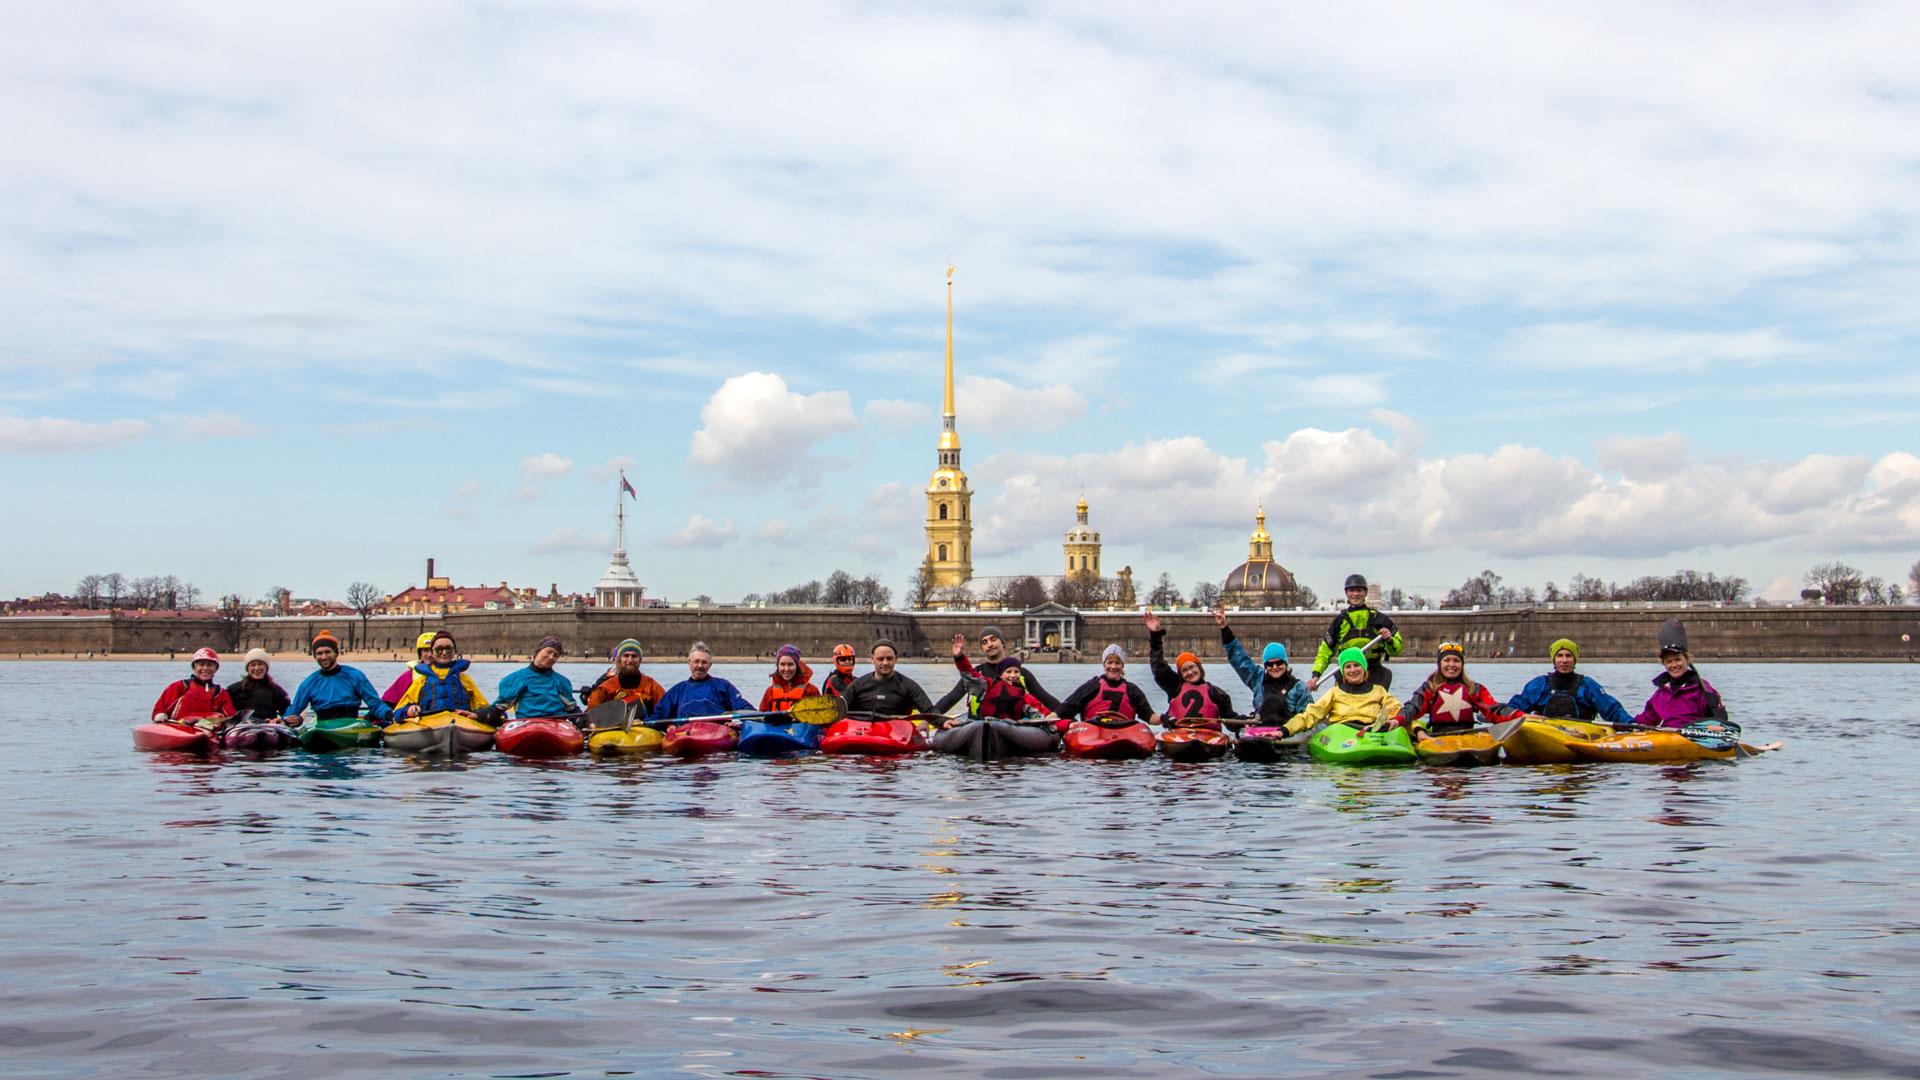 Каякинг в Санкт-Петербурге Питере СПб Каякеры на Неве